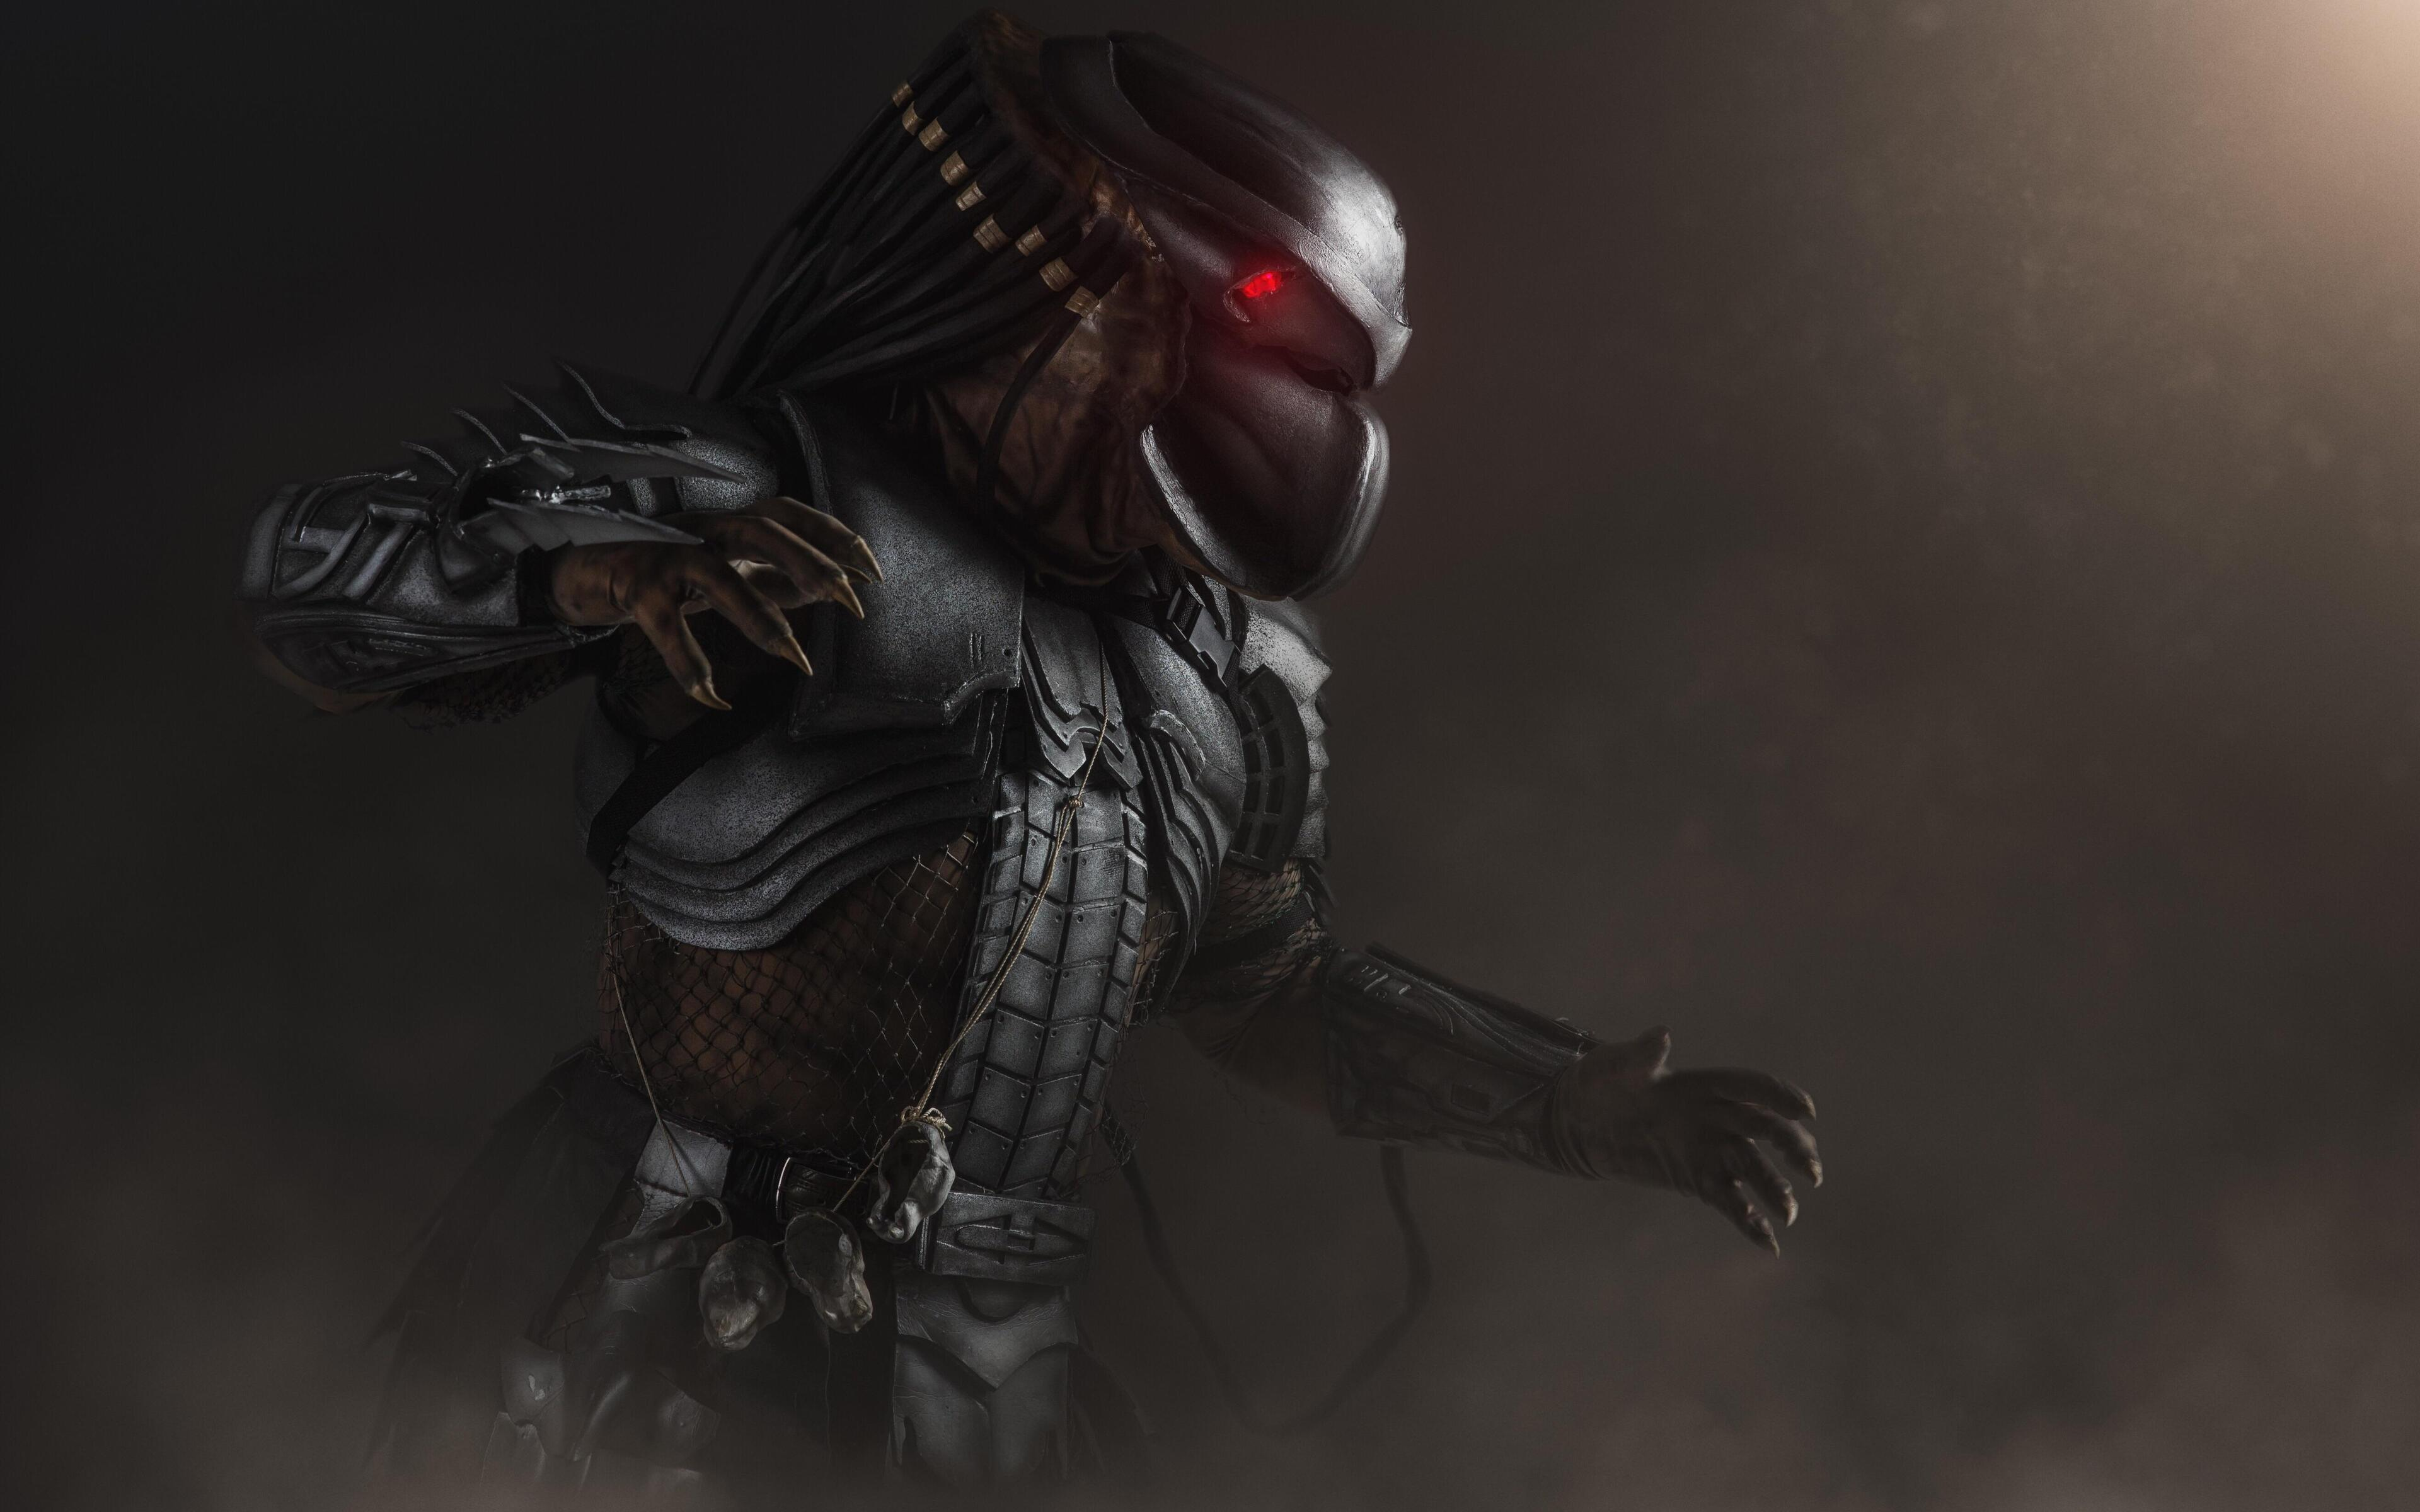 predator-cosplay-zg.jpg